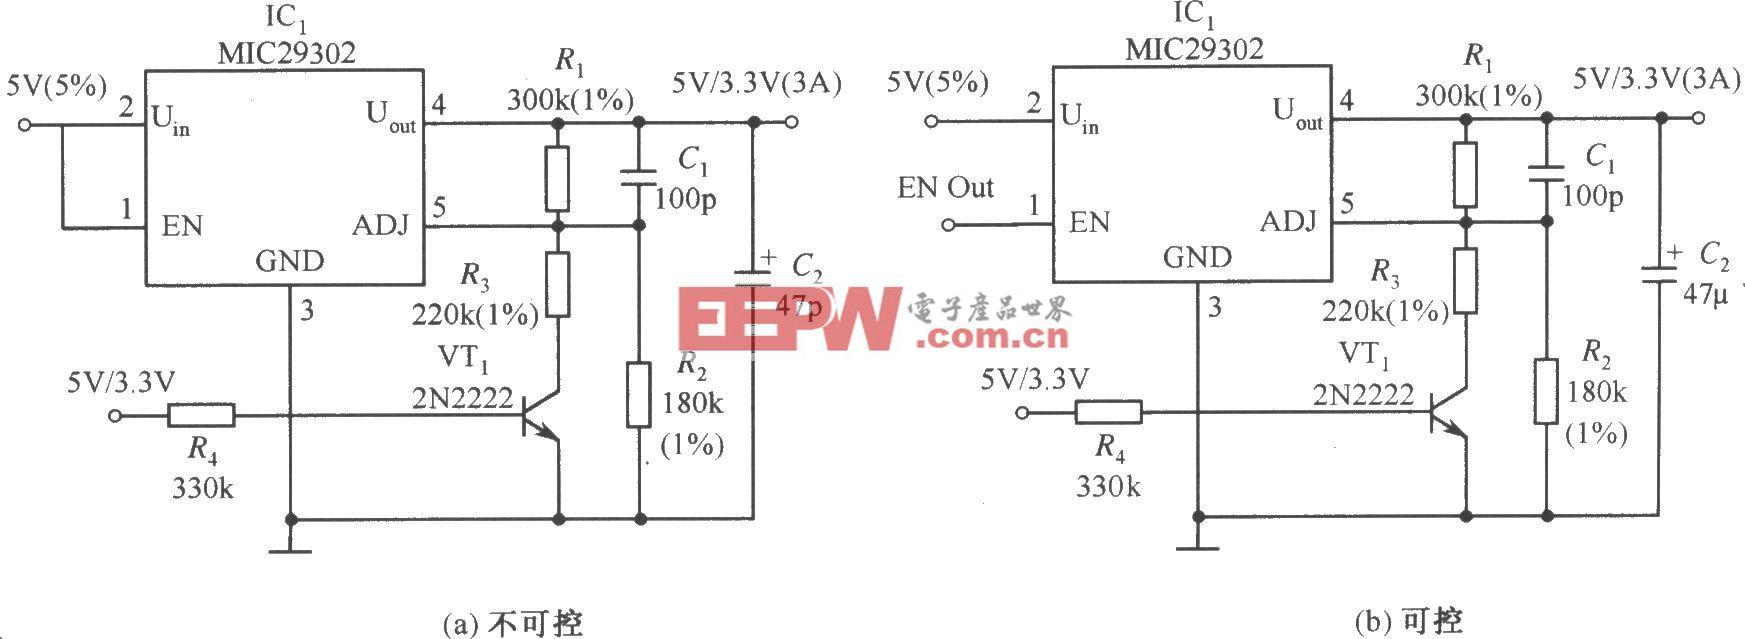 MIC29302构成的输出电压为3.3V/5V可选择的稳压器电路